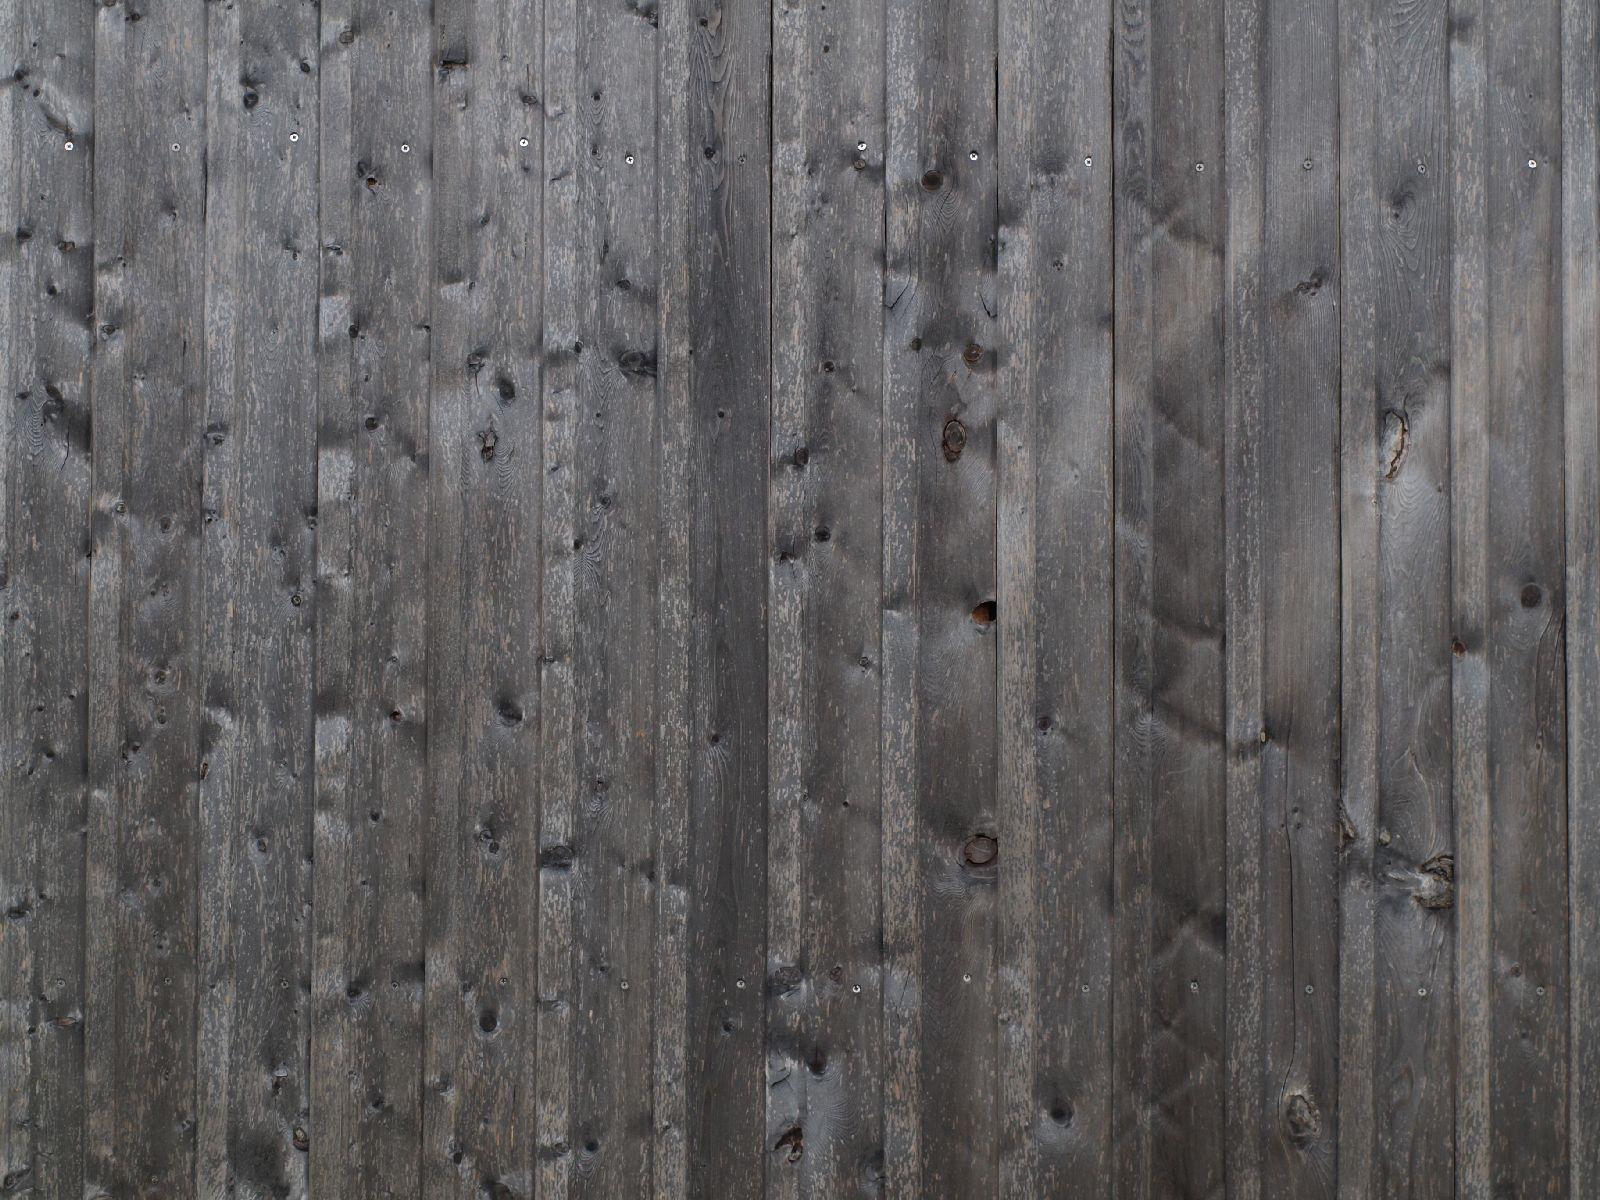 Wood_Texture_A_P6063264